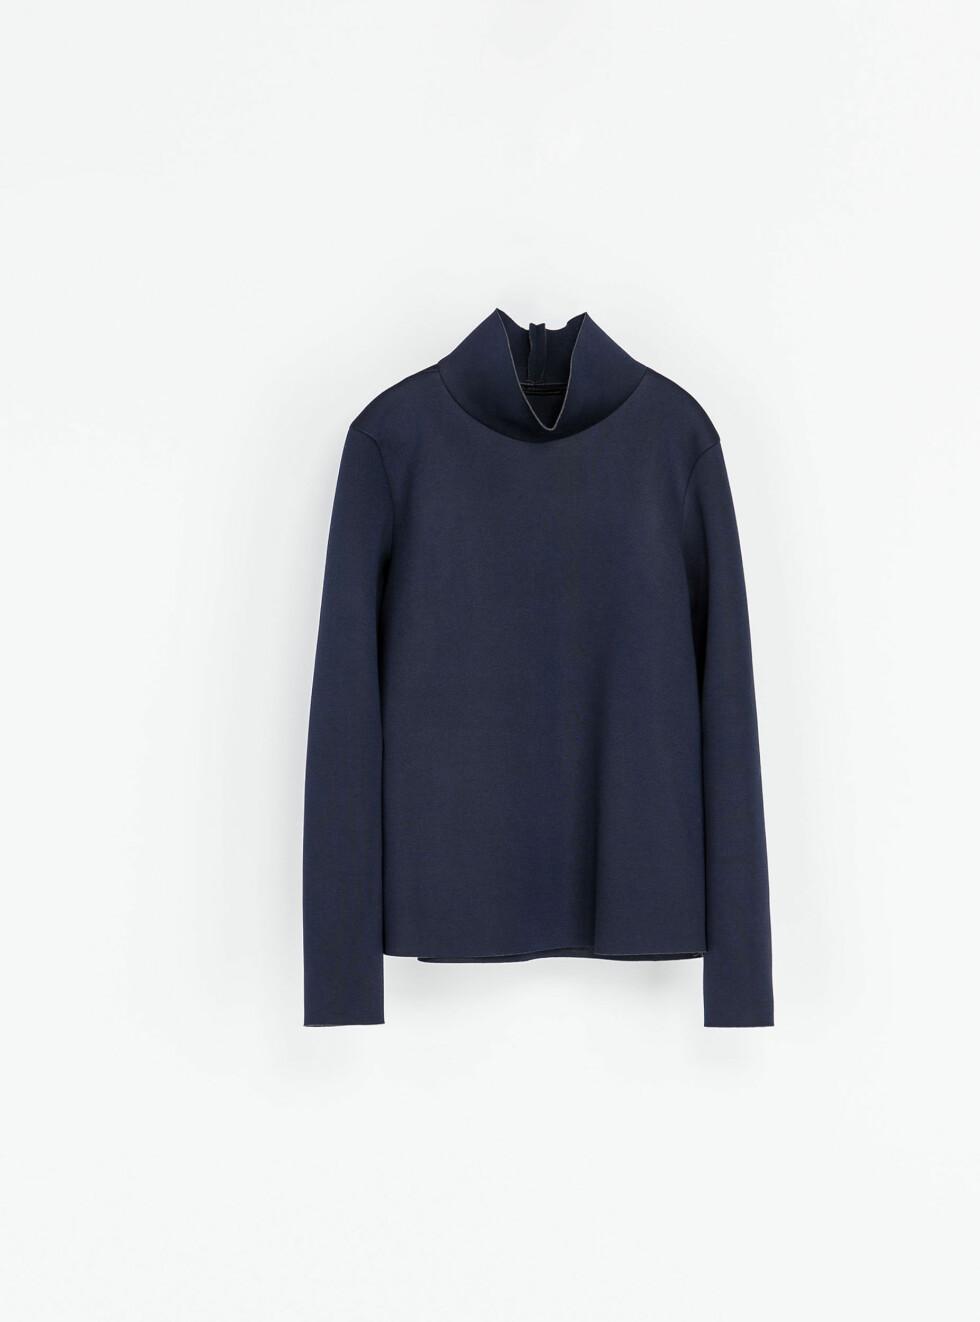 Kr 700, Zara.